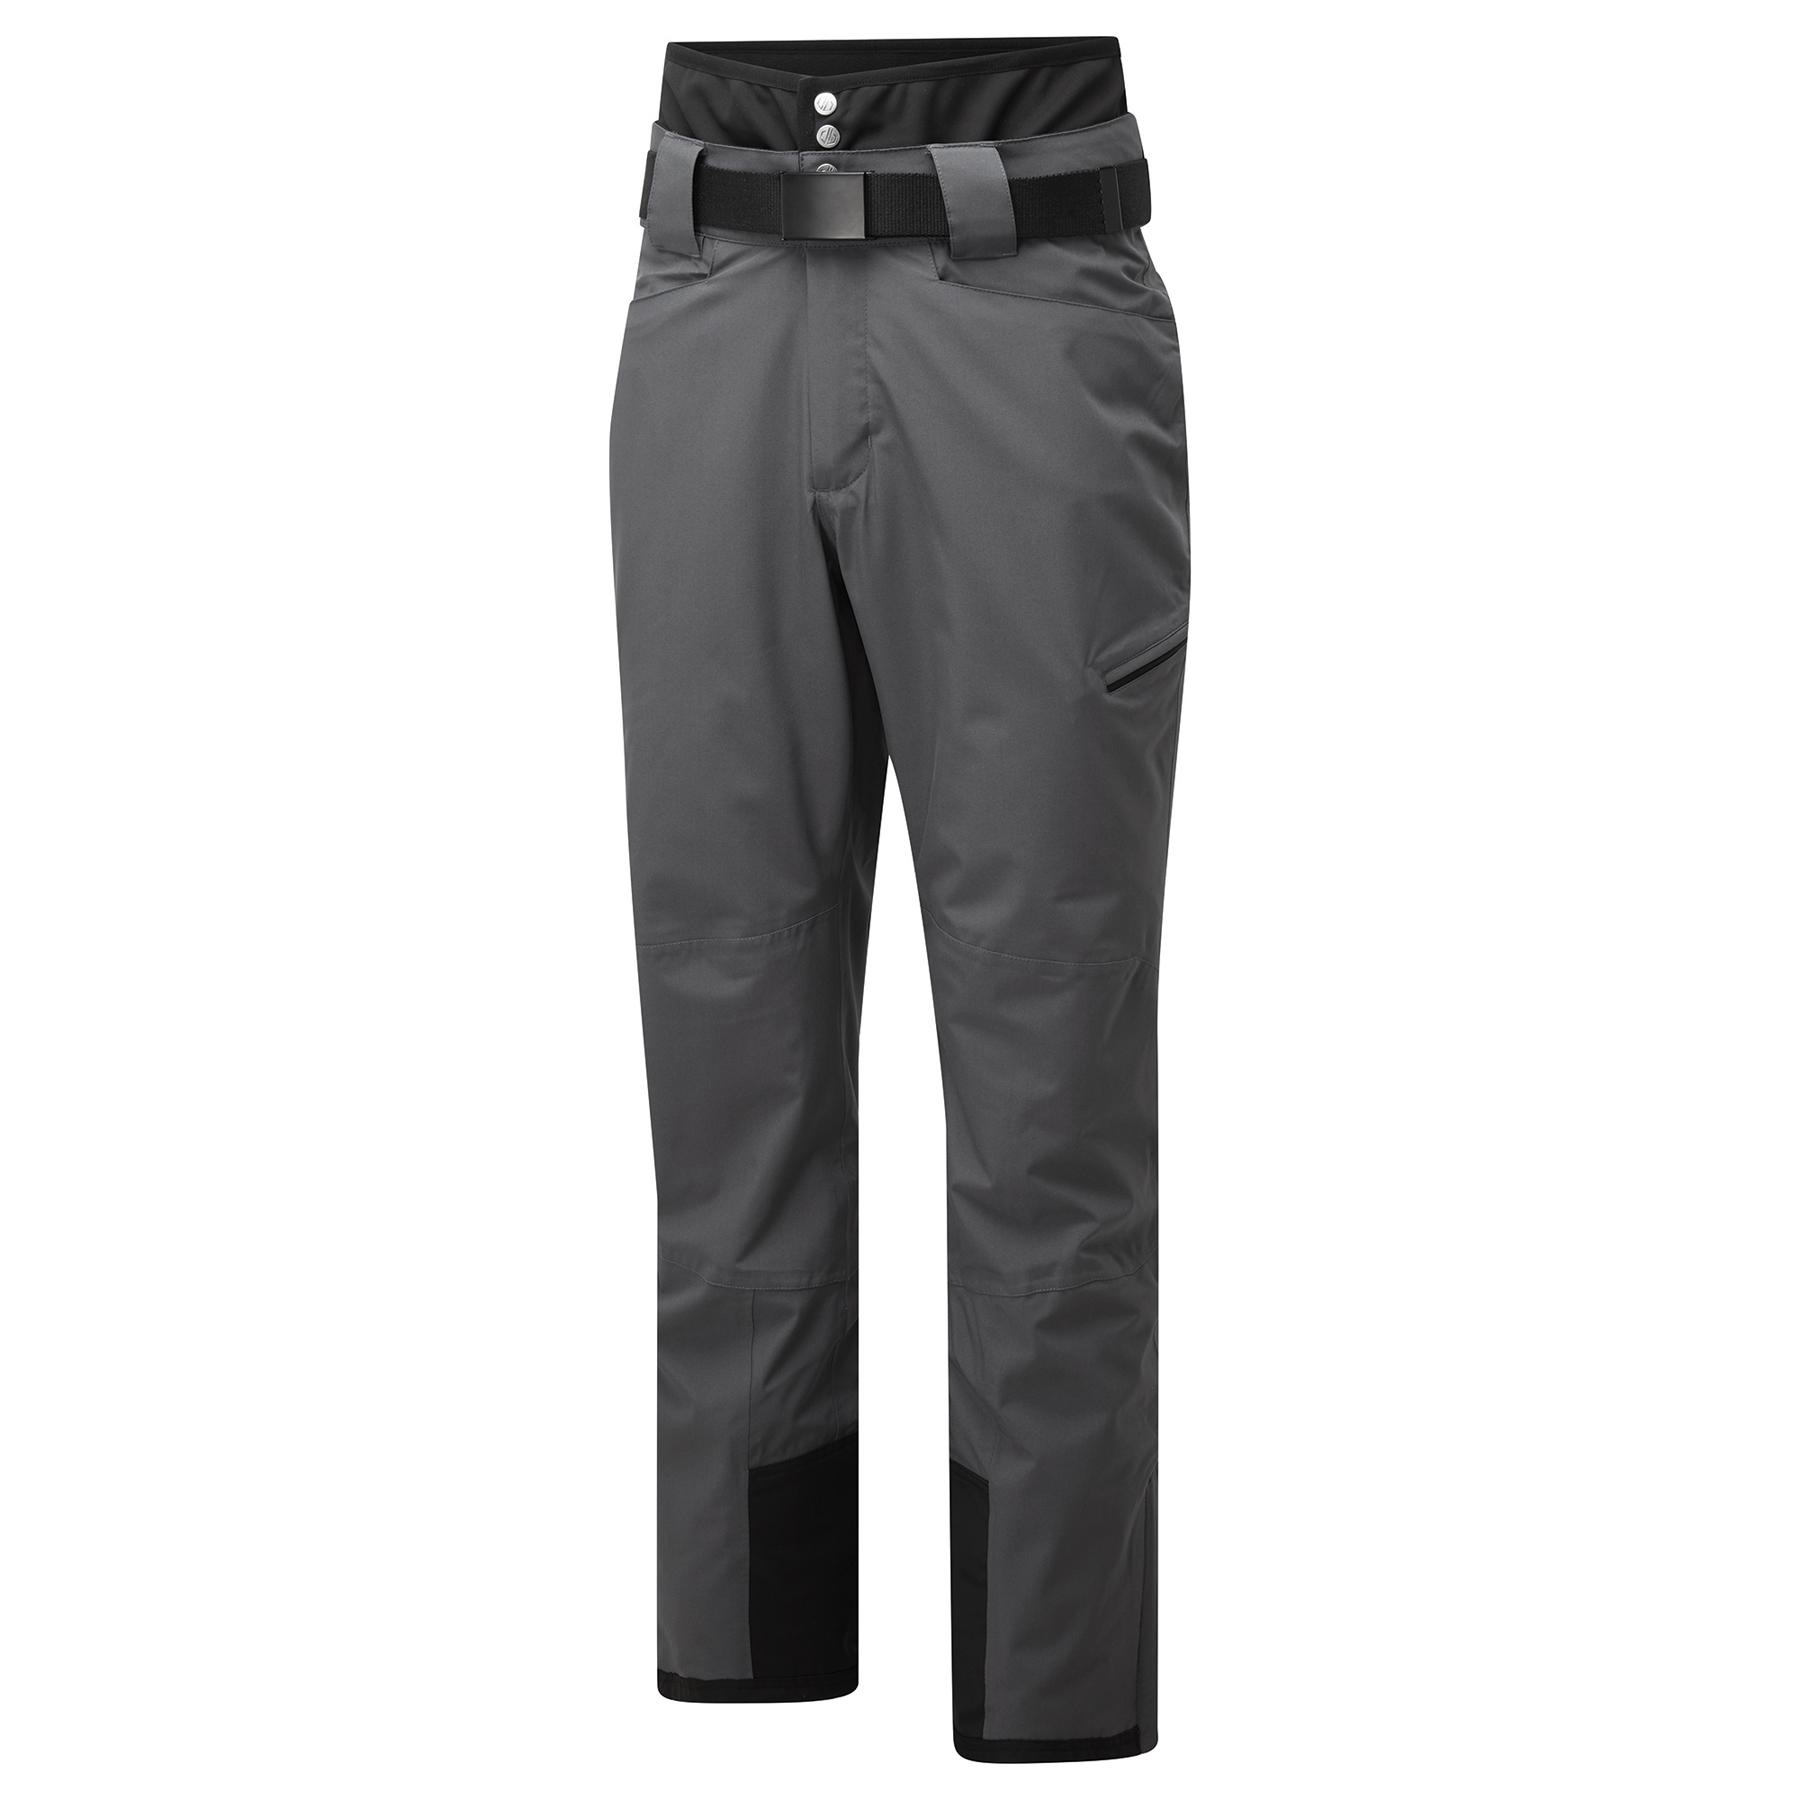 Dare 2b Absolute II Ski Pants - 7CA Ebony Grey/Black